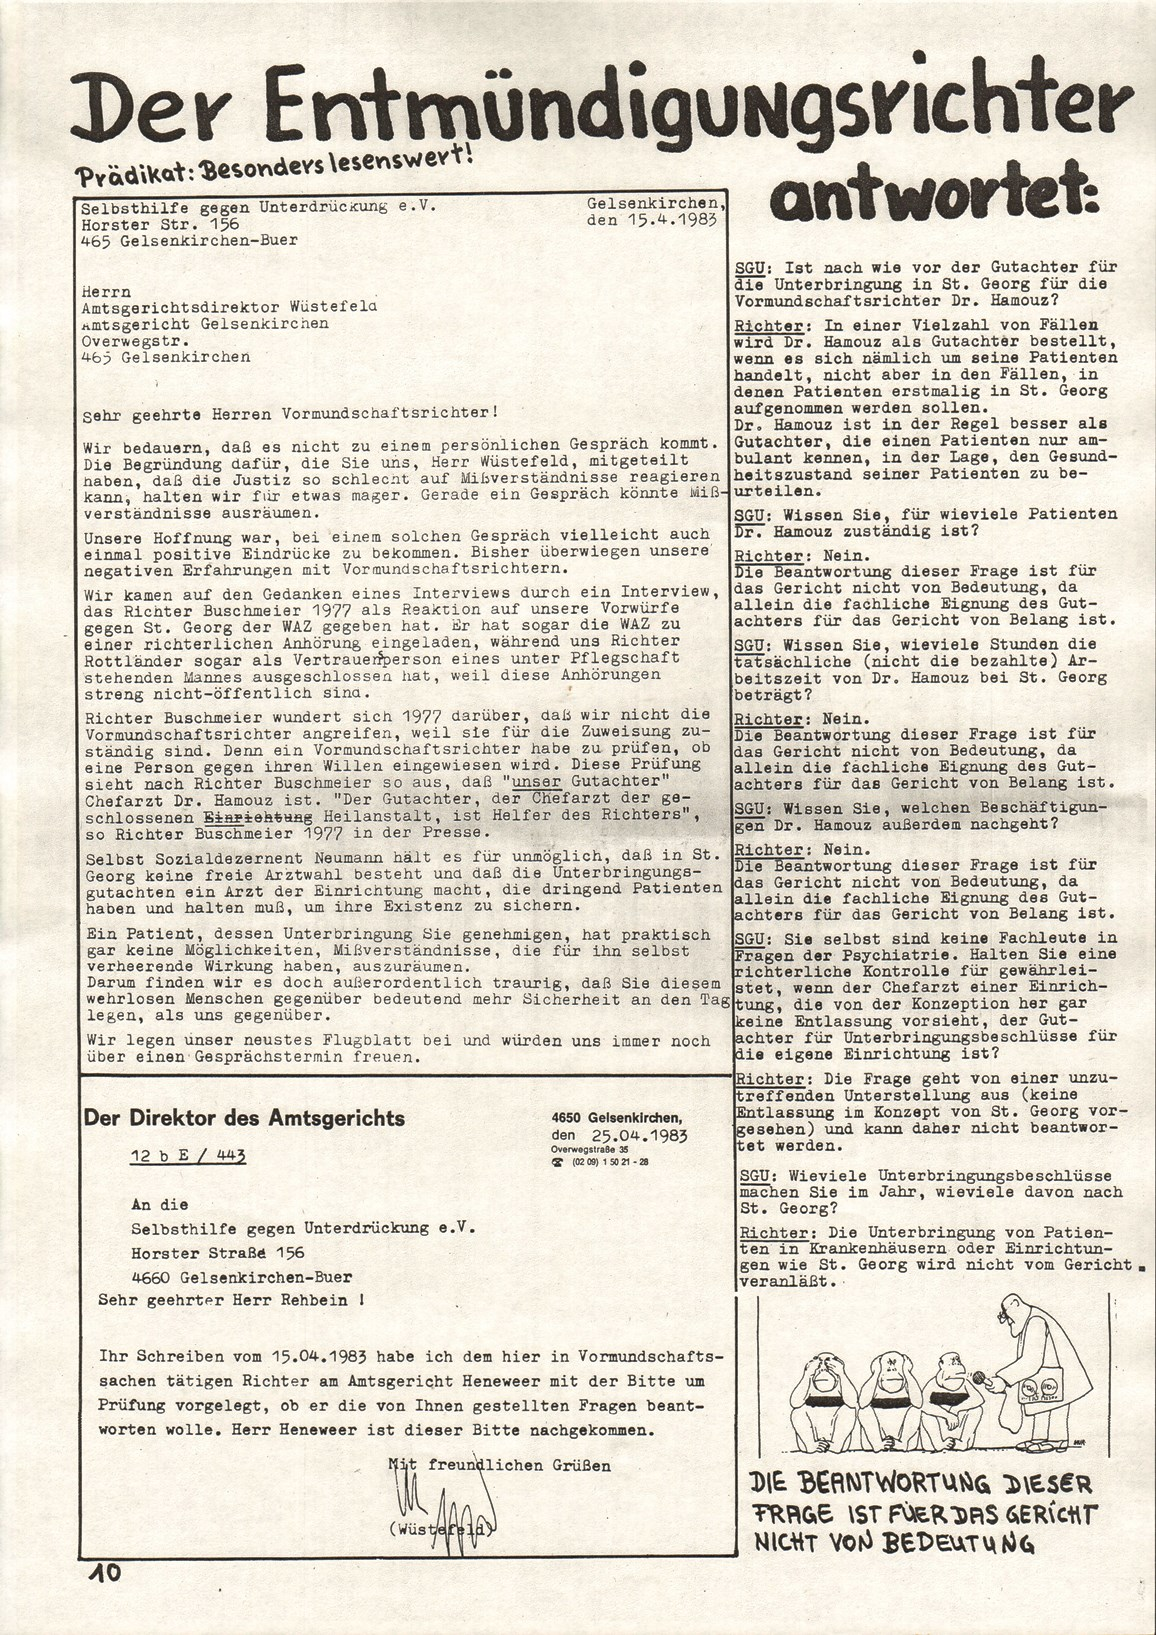 Gelsenkirchen_Selbsthilfe_Blatt_1983_02_10